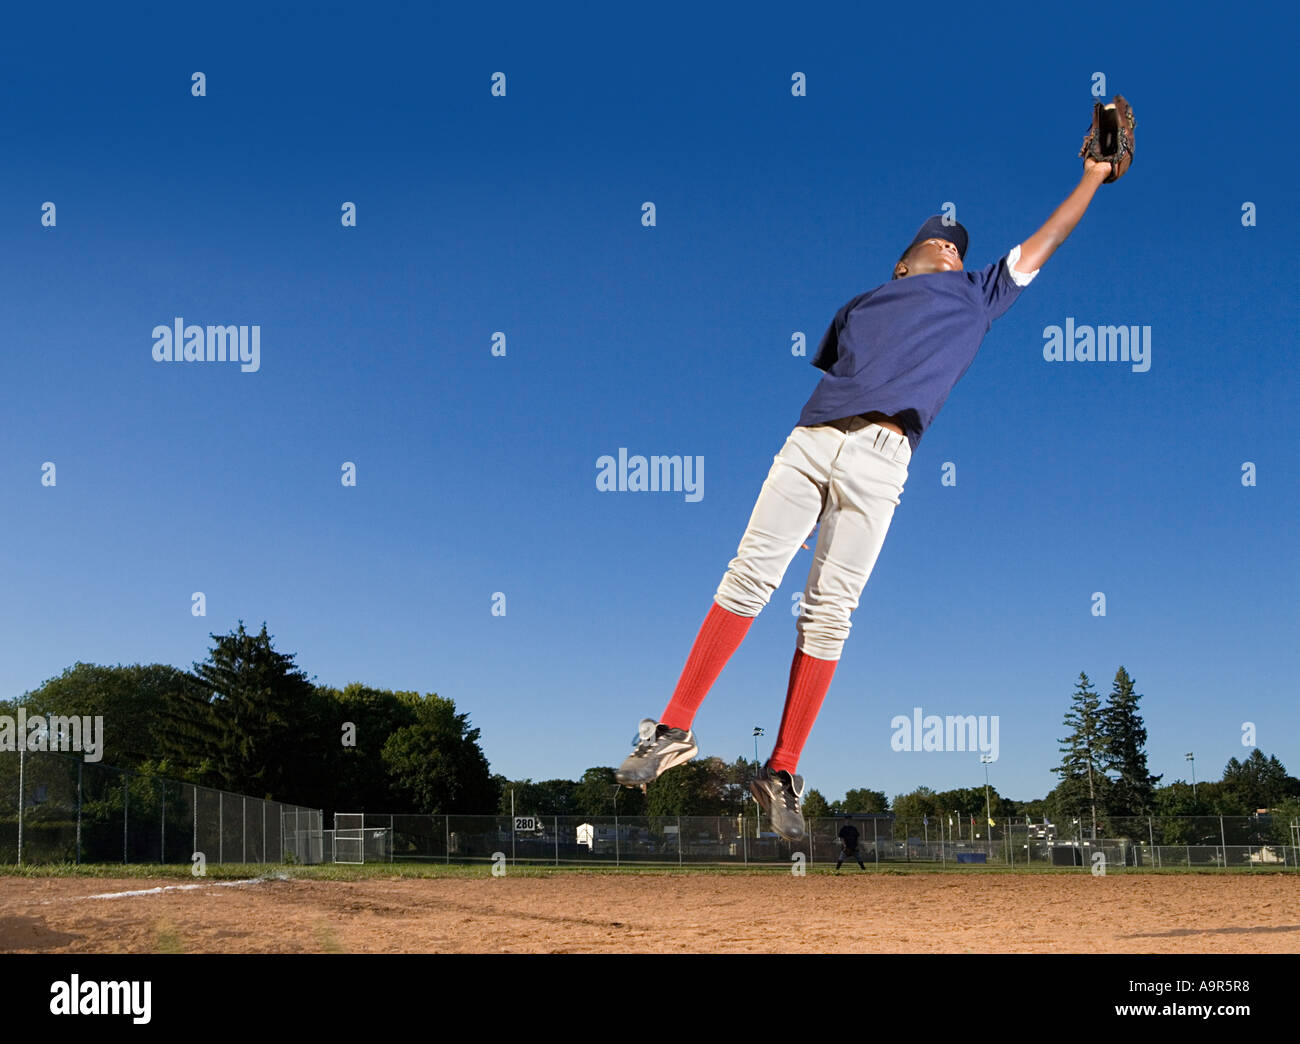 Teenage boy playing baseball - Stock Image